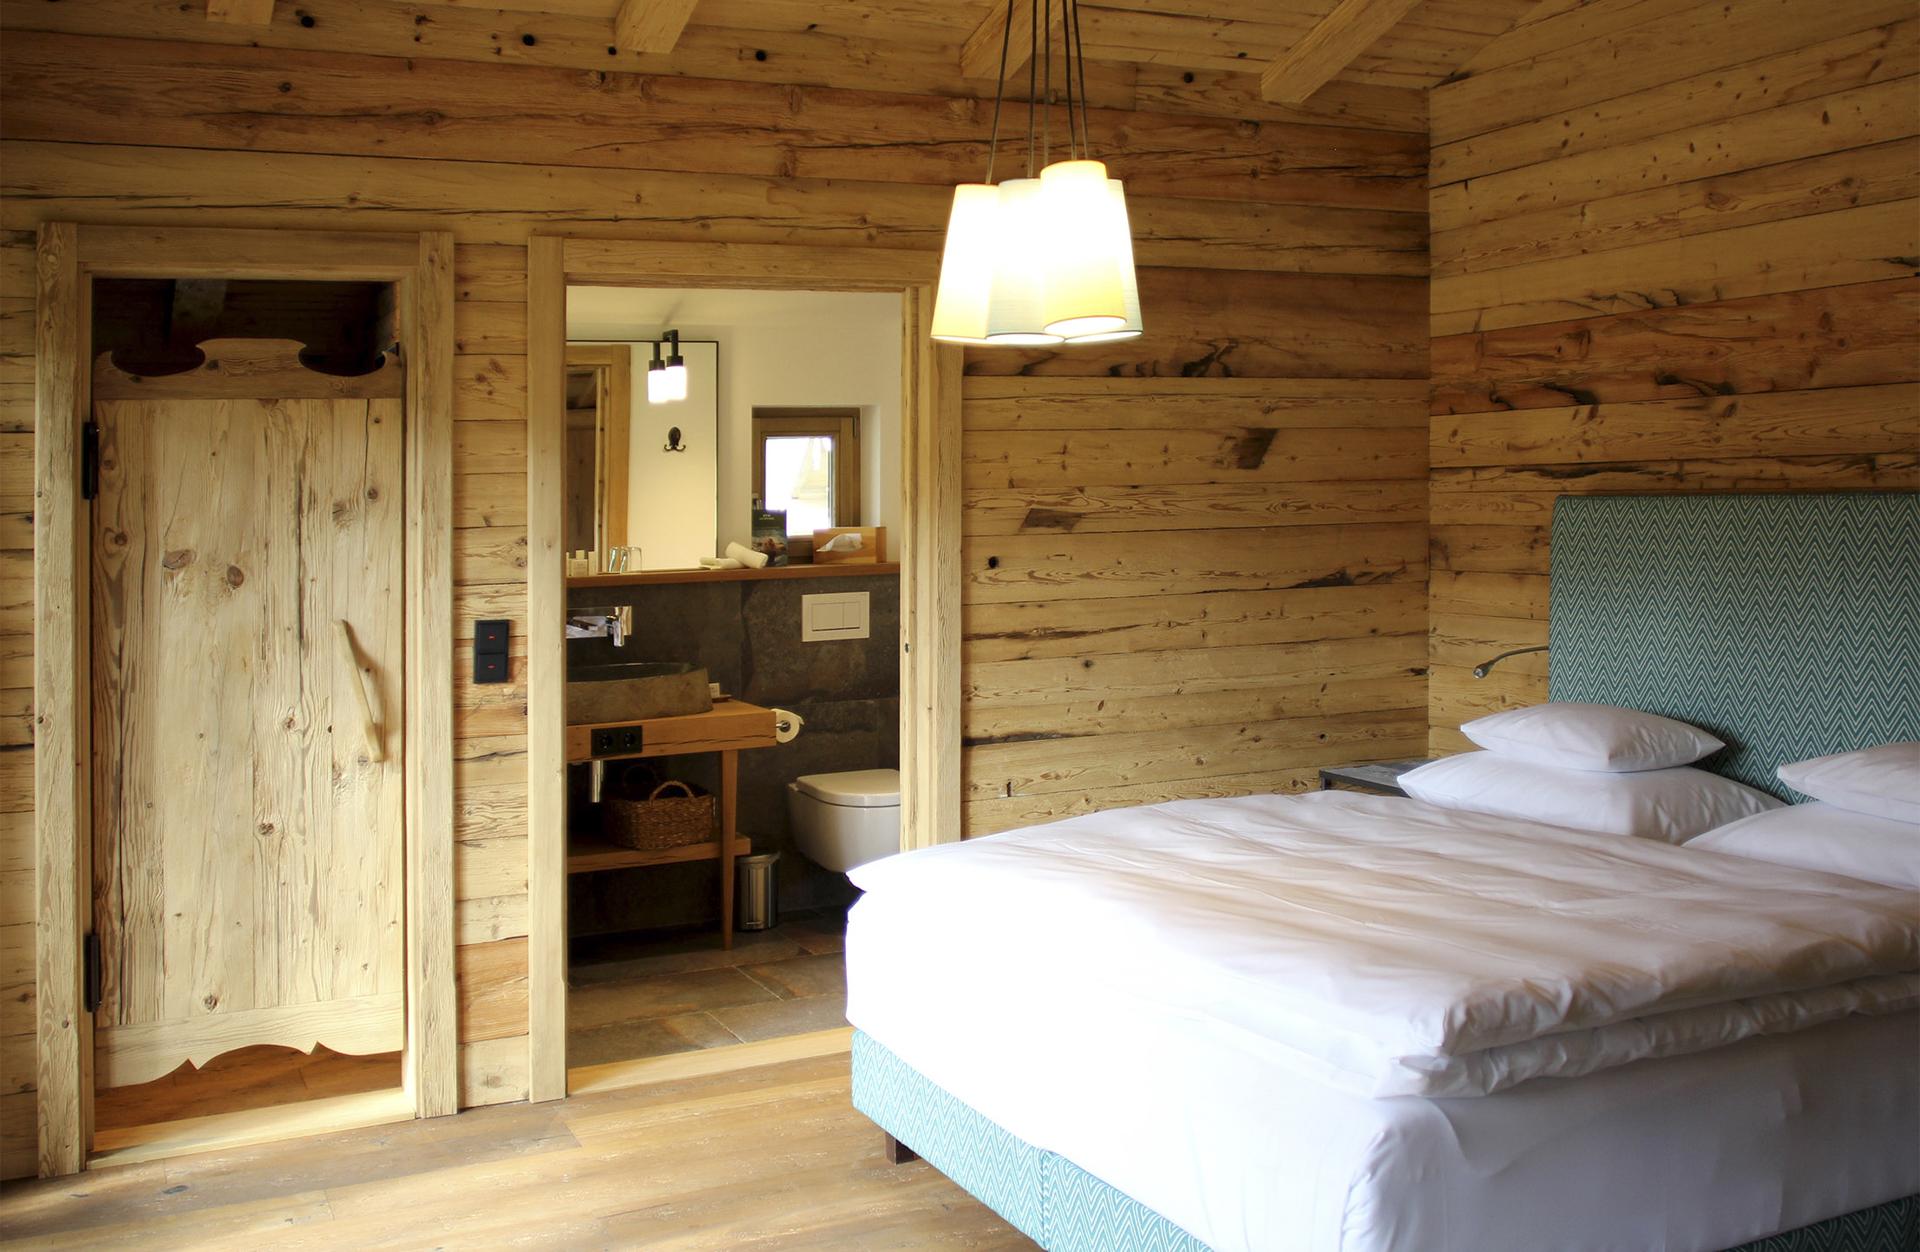 tischlerei-decker-Chalet-Eule-Doppelzimmer-Bett